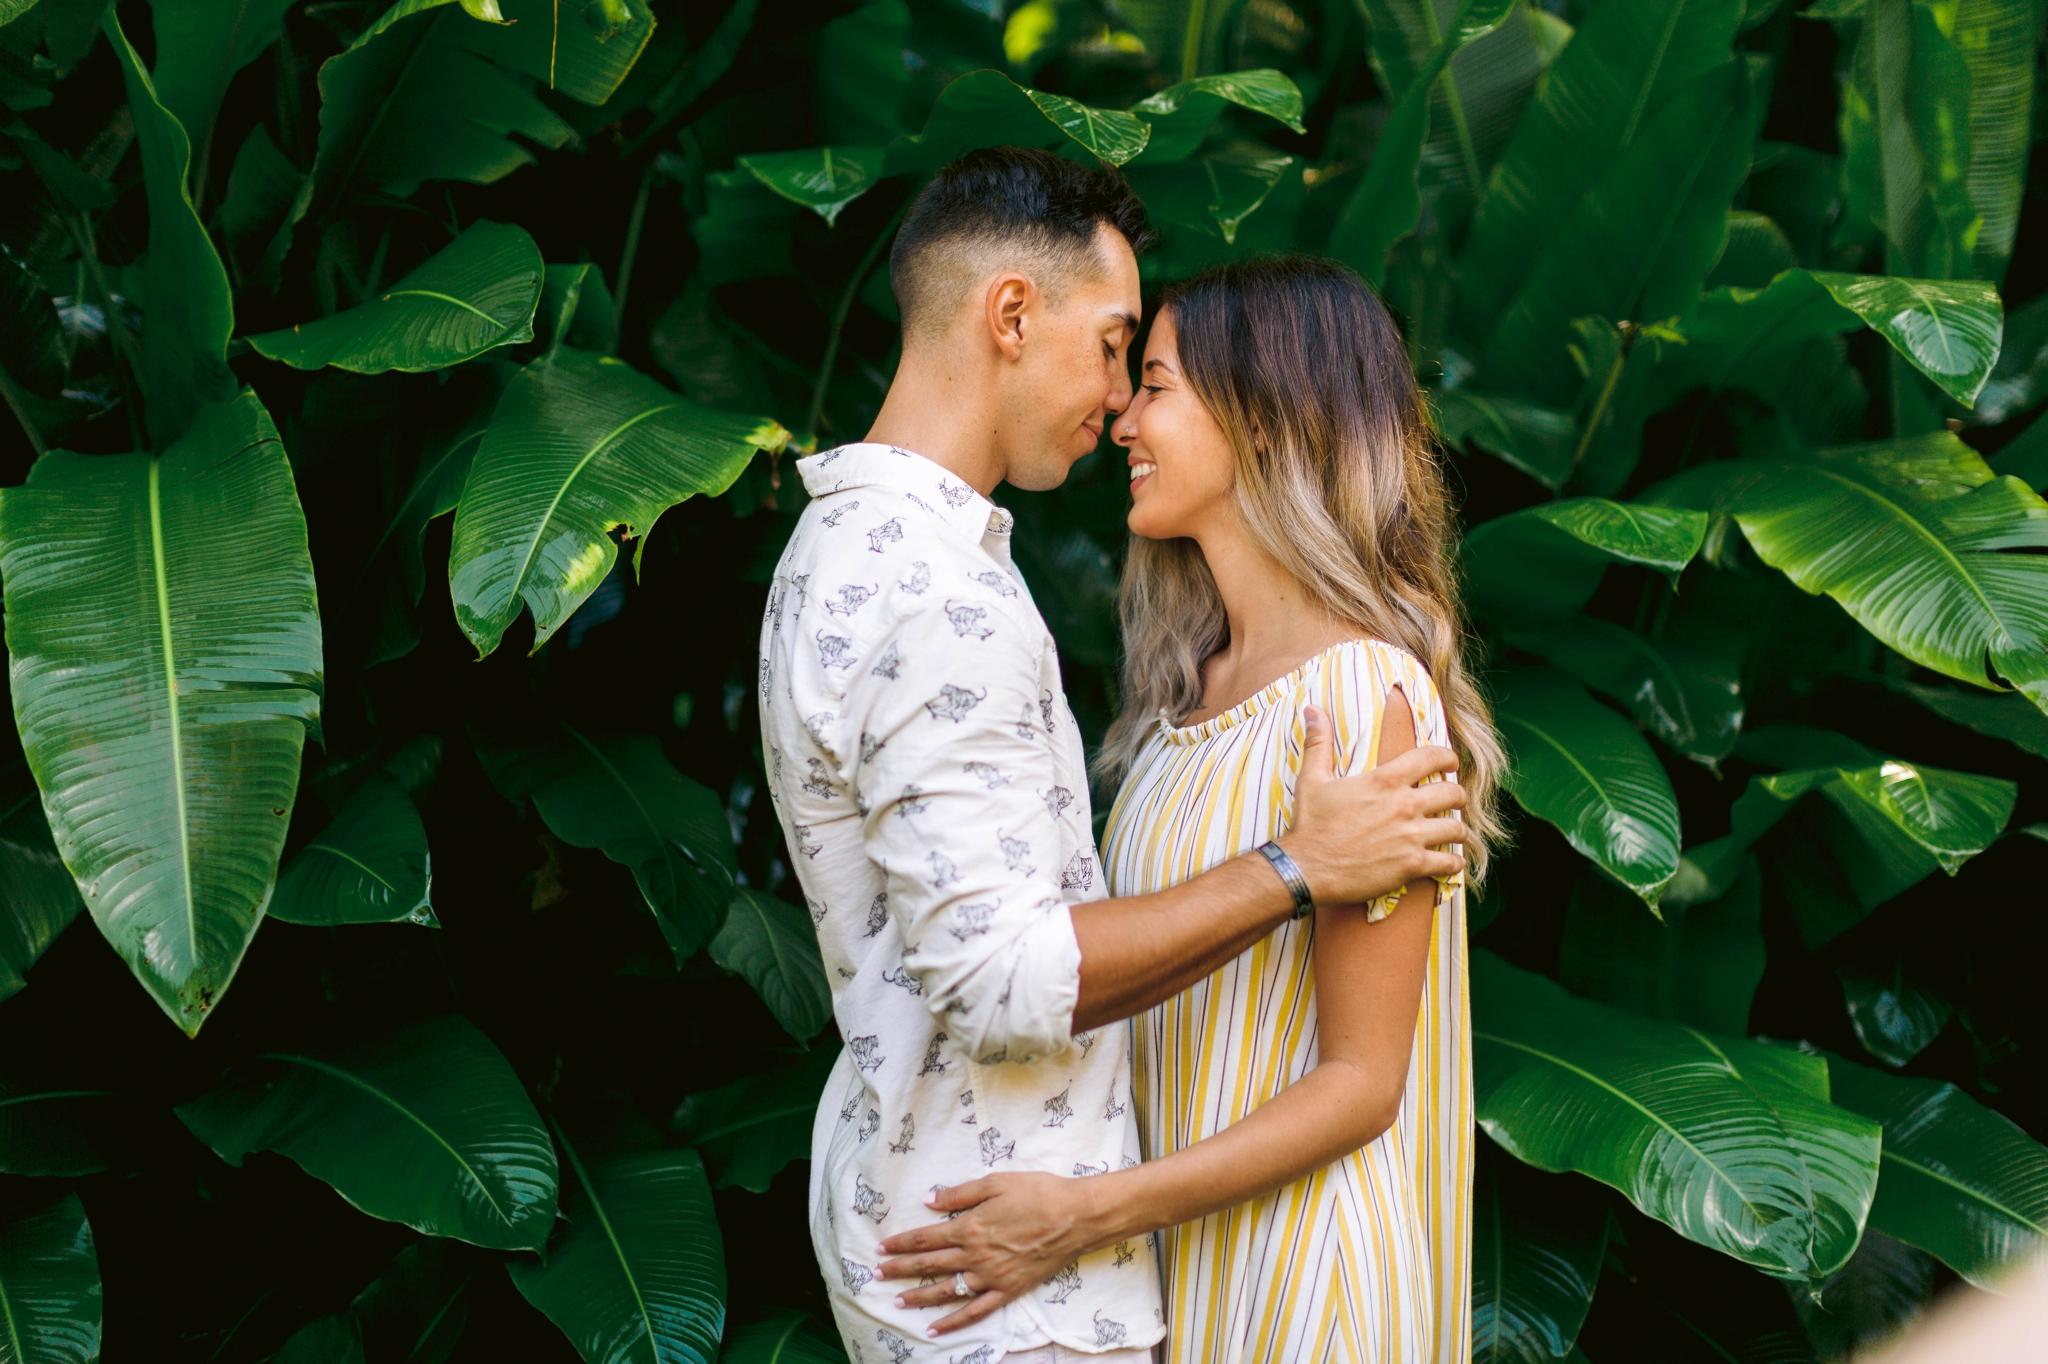 Adventure Couples Session - North Shore, Oahu, Hawaii Engagement Photographer - Johanna Dye